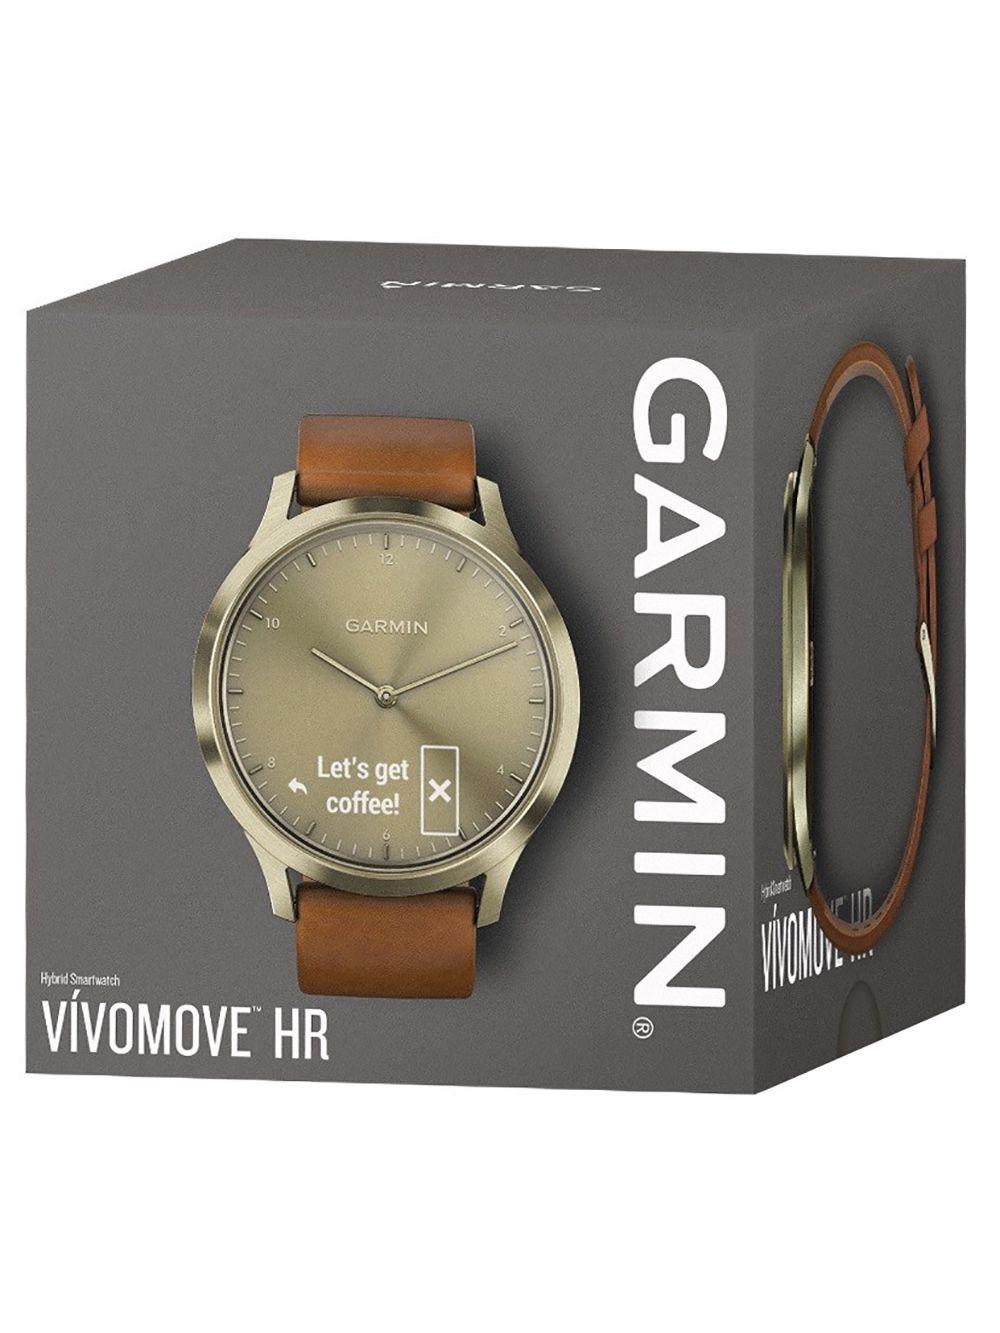 garmin vivomove hr premium ladies smartwatch s m light. Black Bedroom Furniture Sets. Home Design Ideas